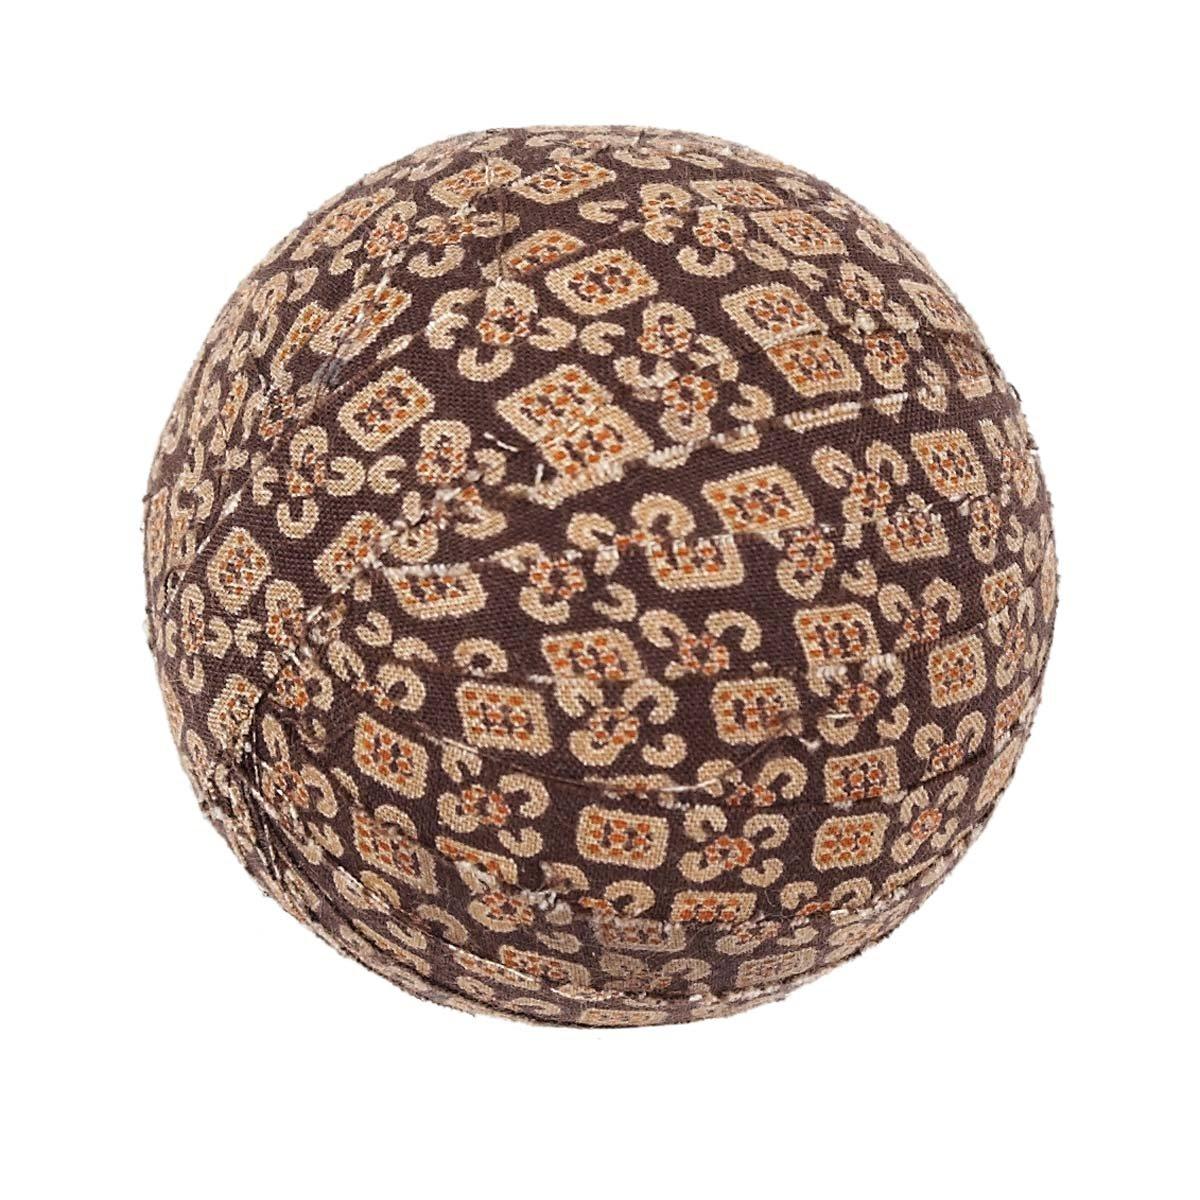 VHC Brands Rustic /& Lodge Decor Tacoma Brown #10 Round Fabric Ball Set of 6 2.5 Diameter Dark 10648